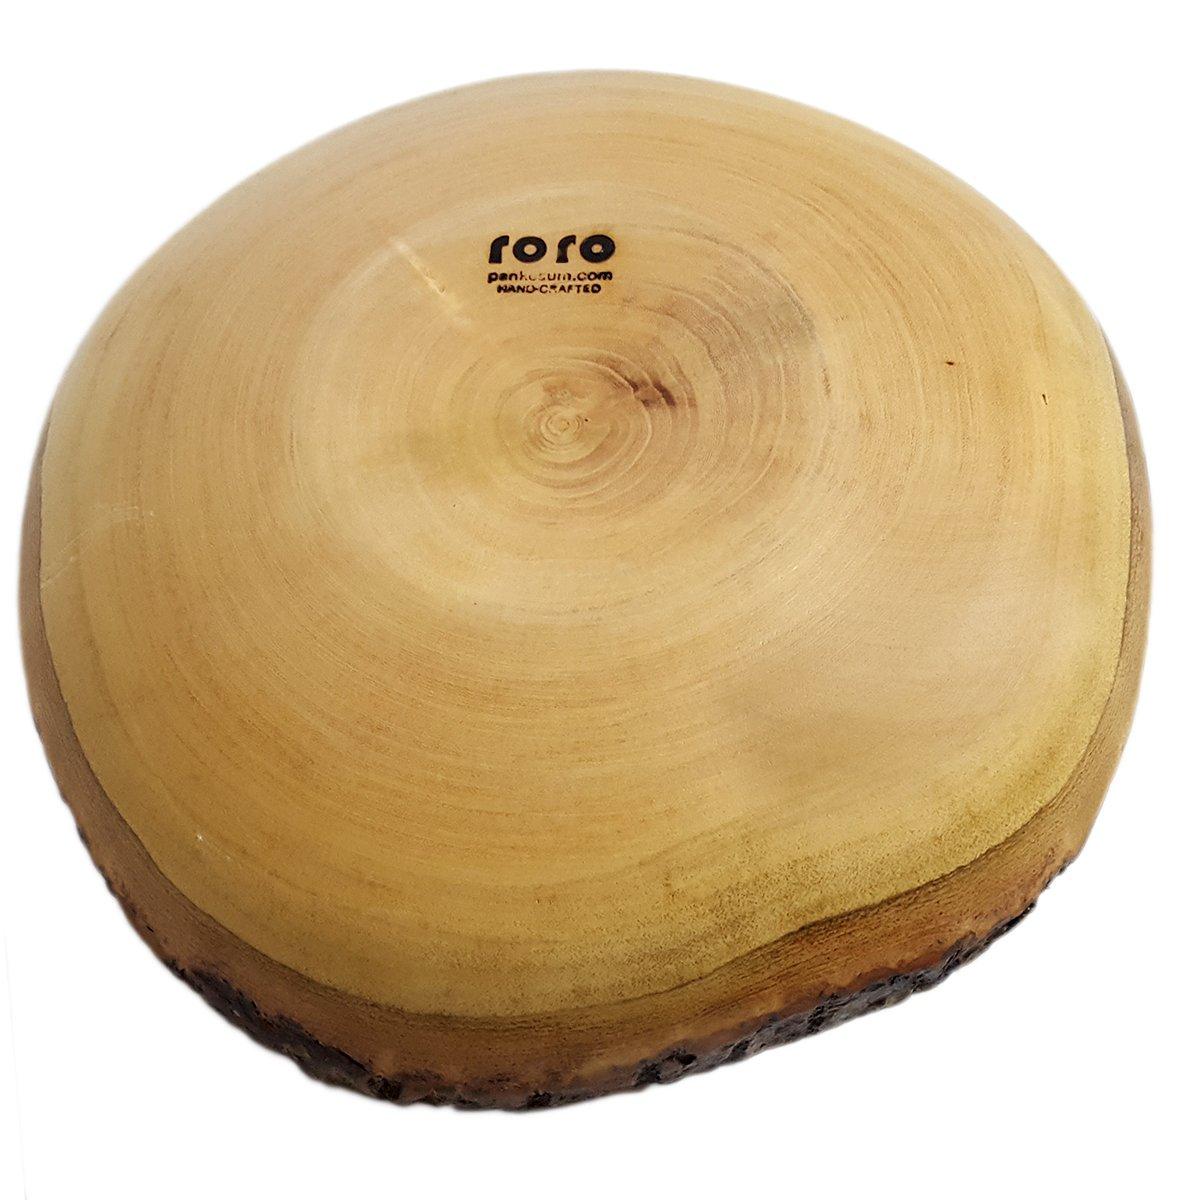 roro Handcarved Wood Fruit and Centerpiece Bowl 12 Inch Live-Edge Bark Pankesum RRoBowBk12